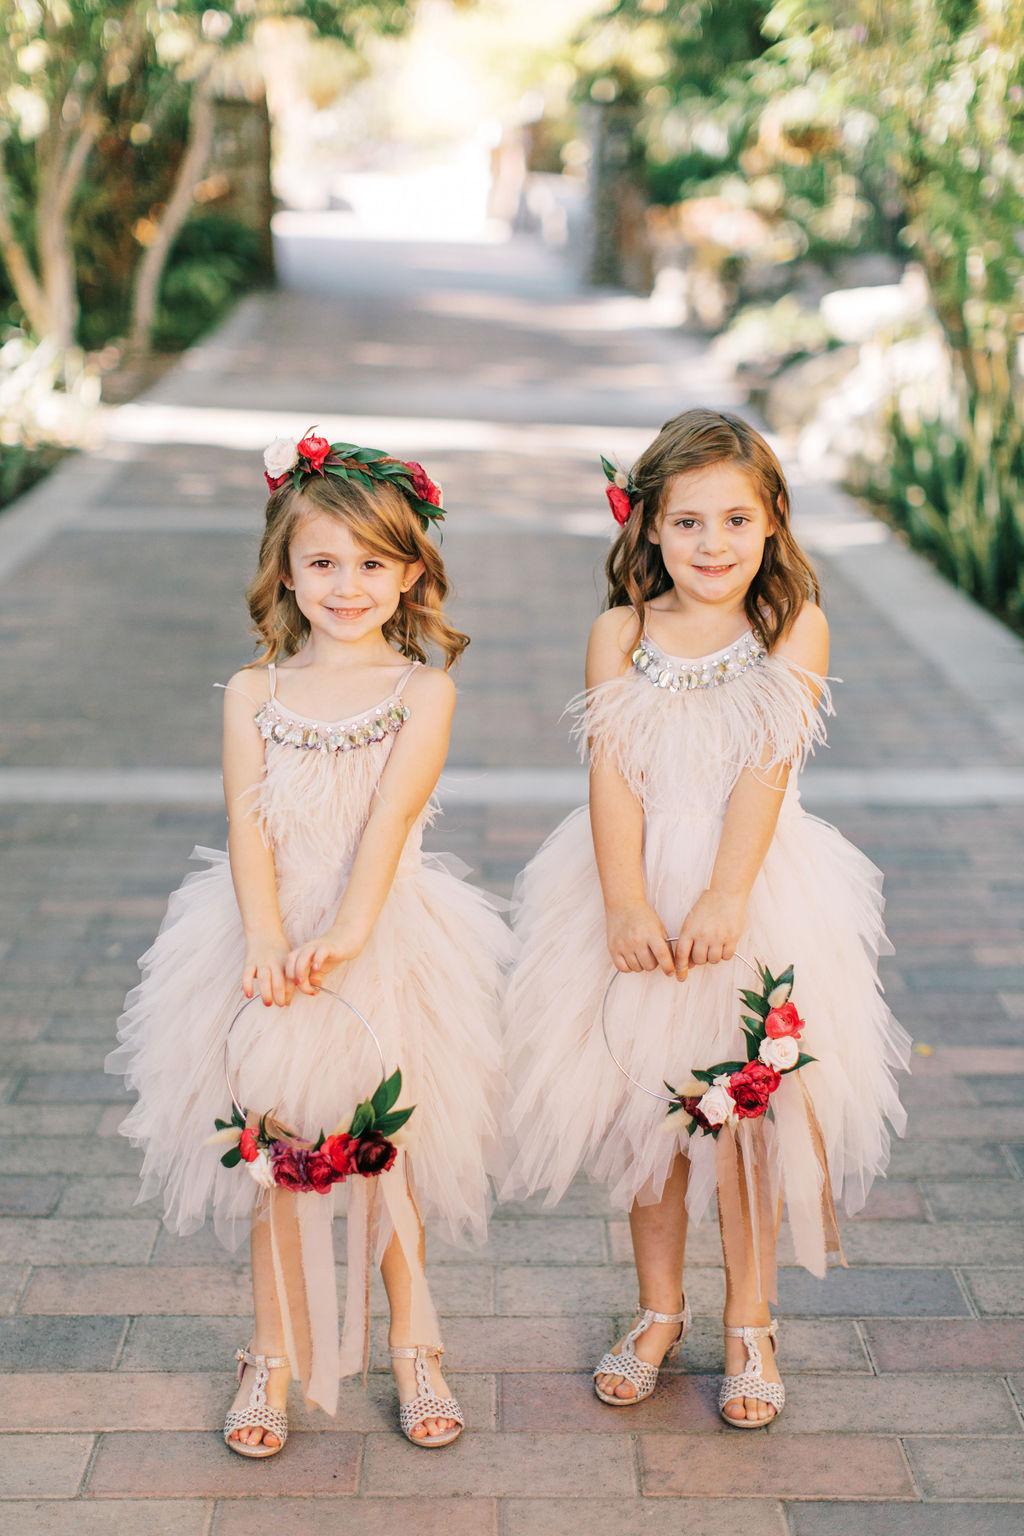 meagan robert wedding flower girls in mauve tool dresses holding baskets